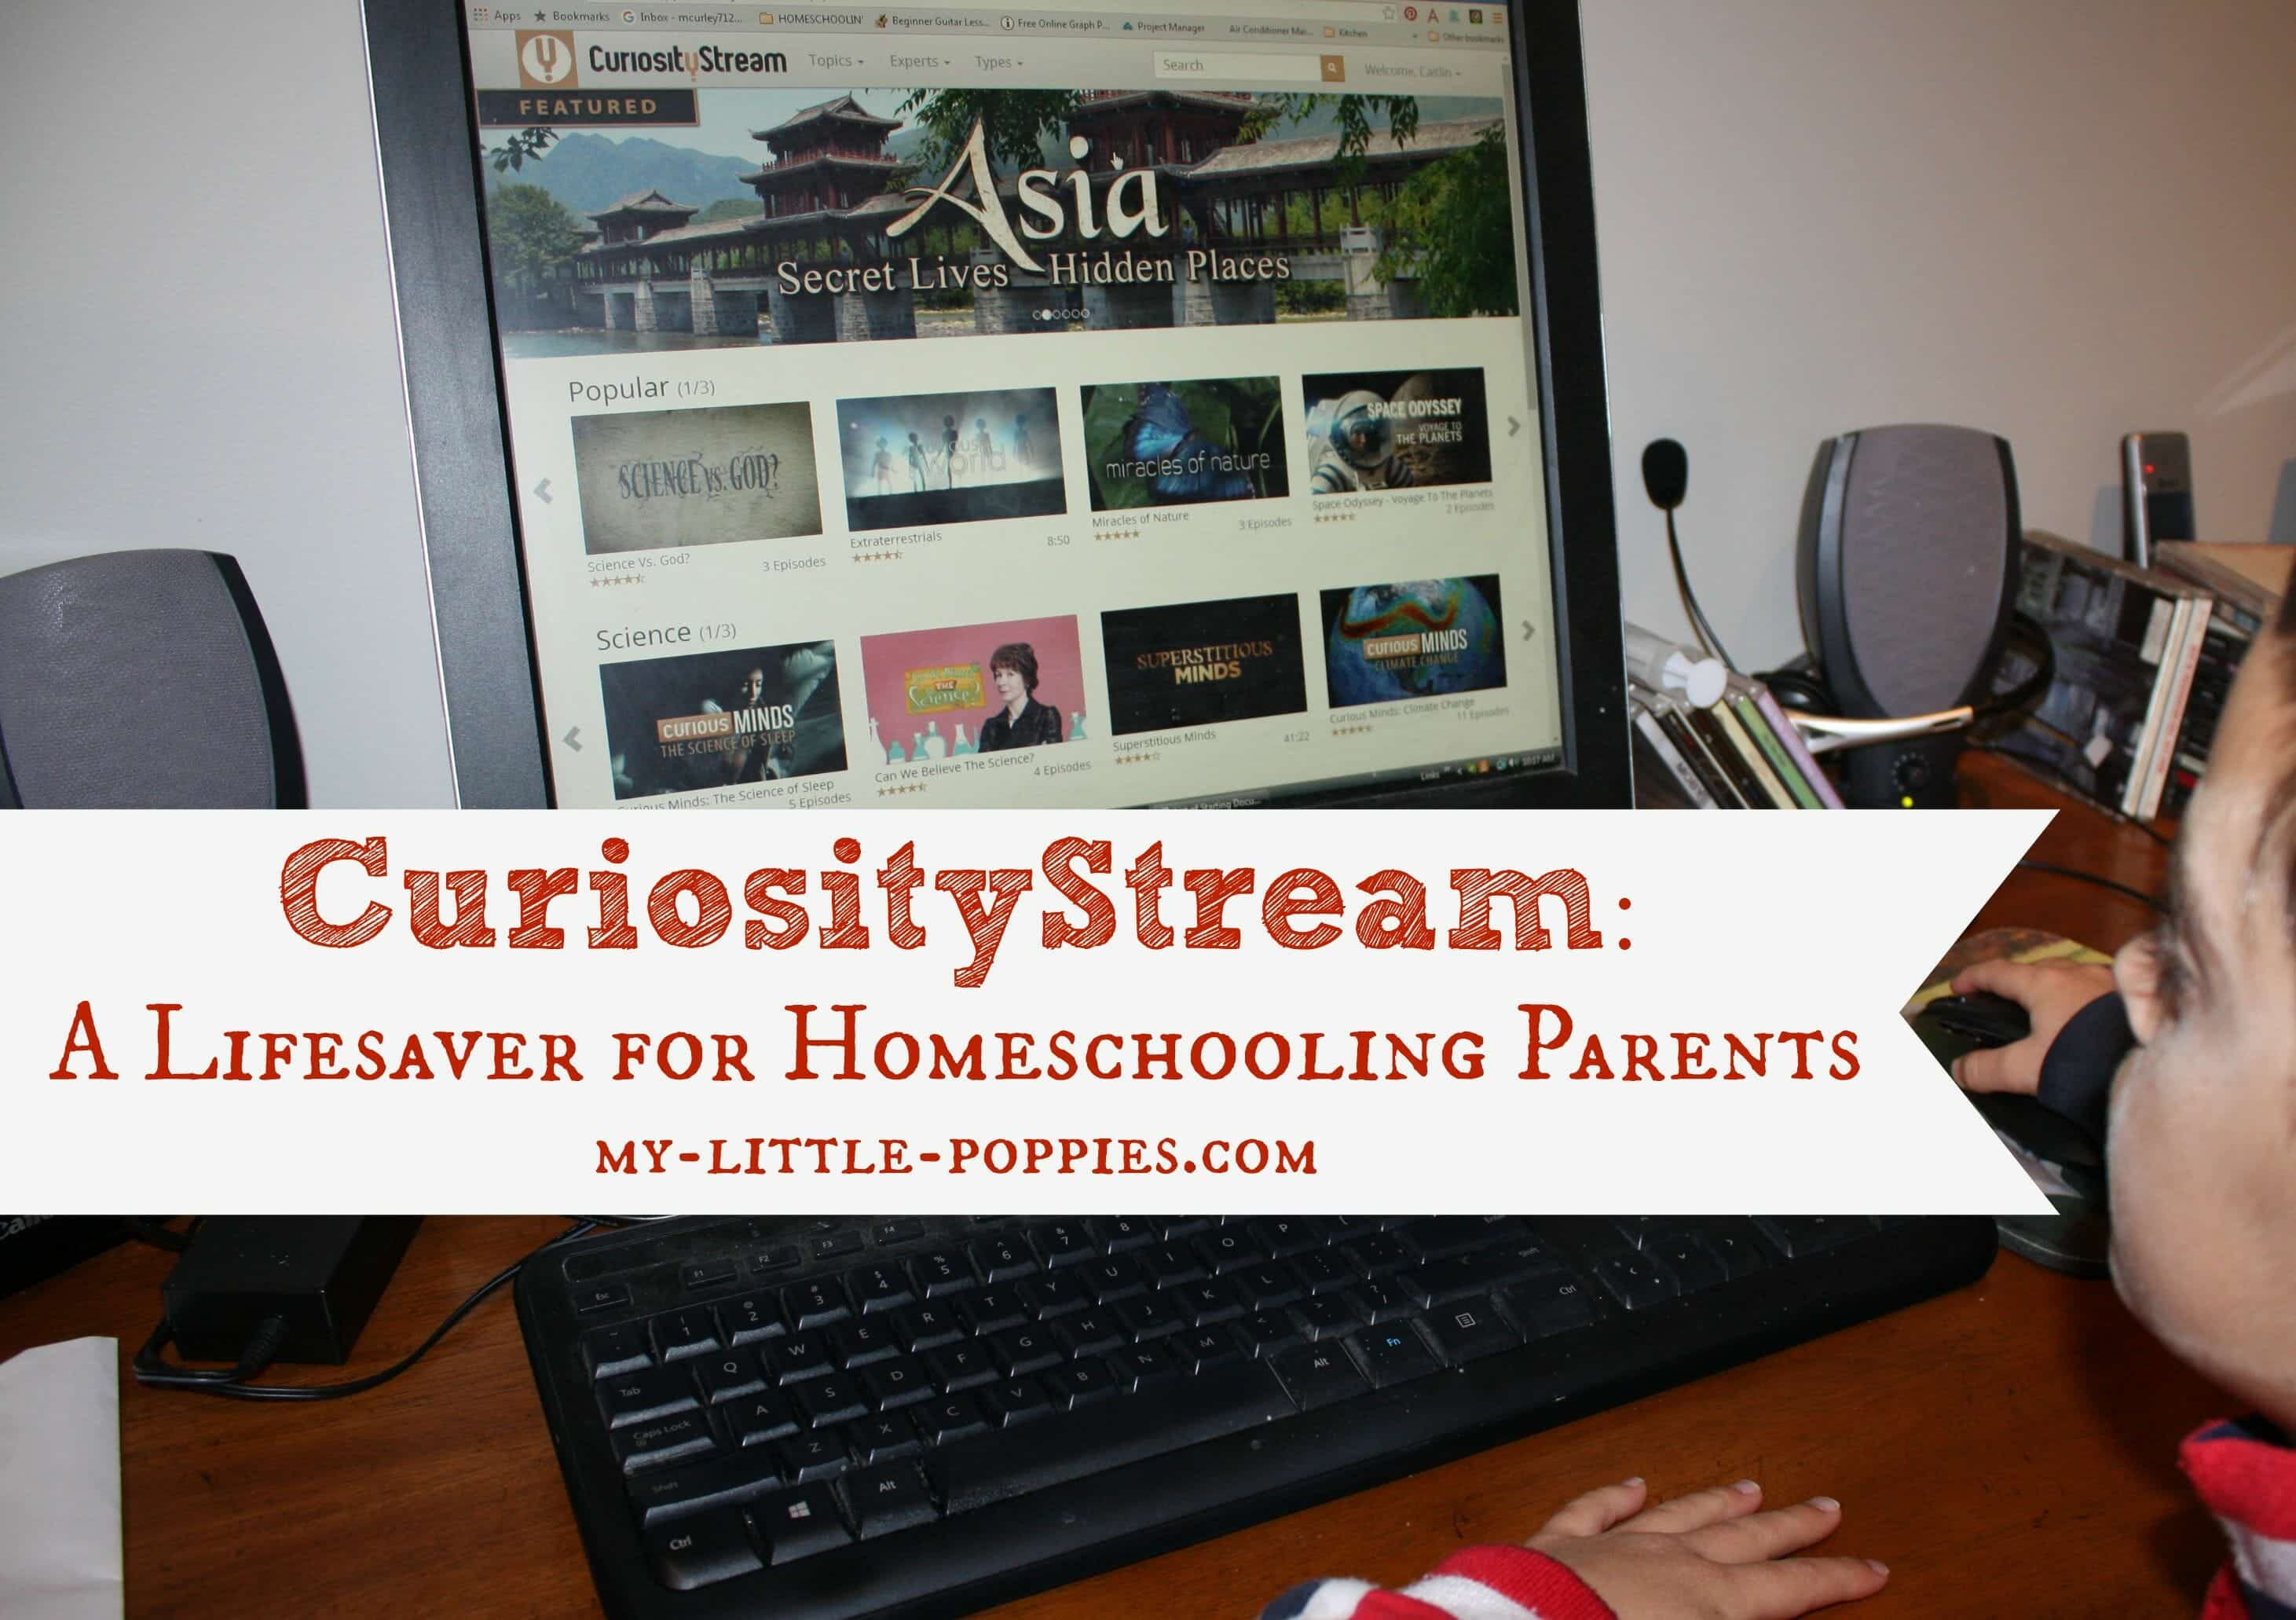 Curiosity Stream: A Lifesaver for Homeschooling Parents | My